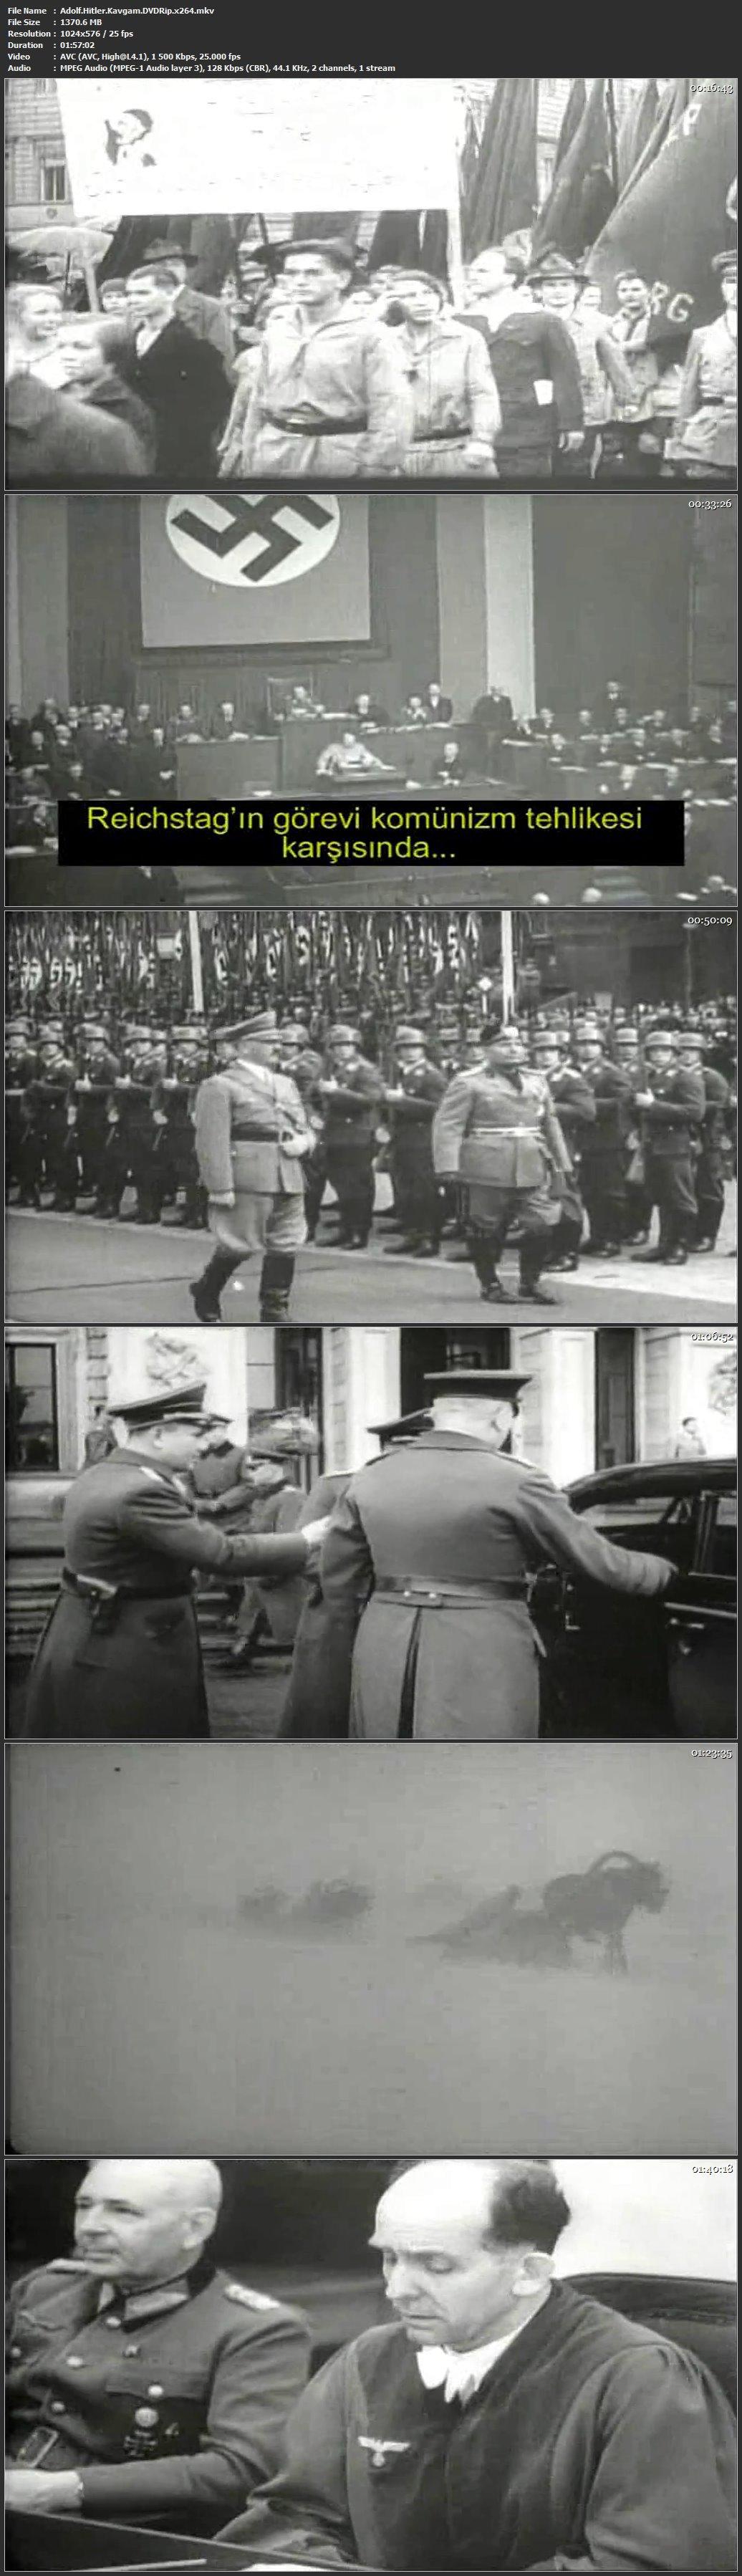 Adolf.Hitler.Kavgam.DVDRip.x264.mkv.jpg